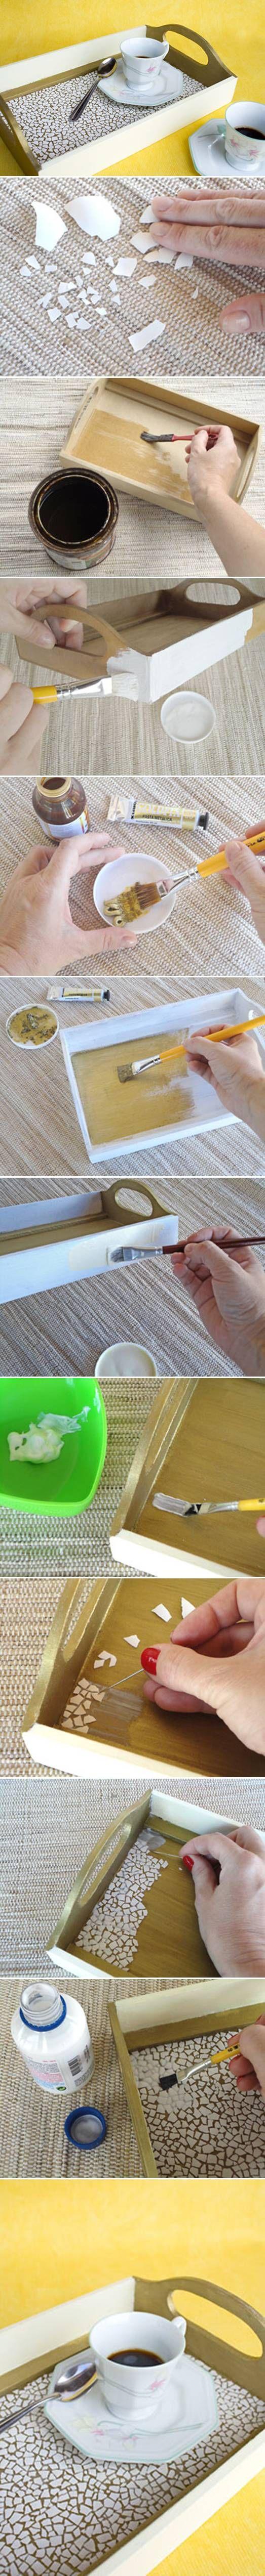 DIY Eggshell Mosaic Tray DIY Eggshell Mosaic Tray